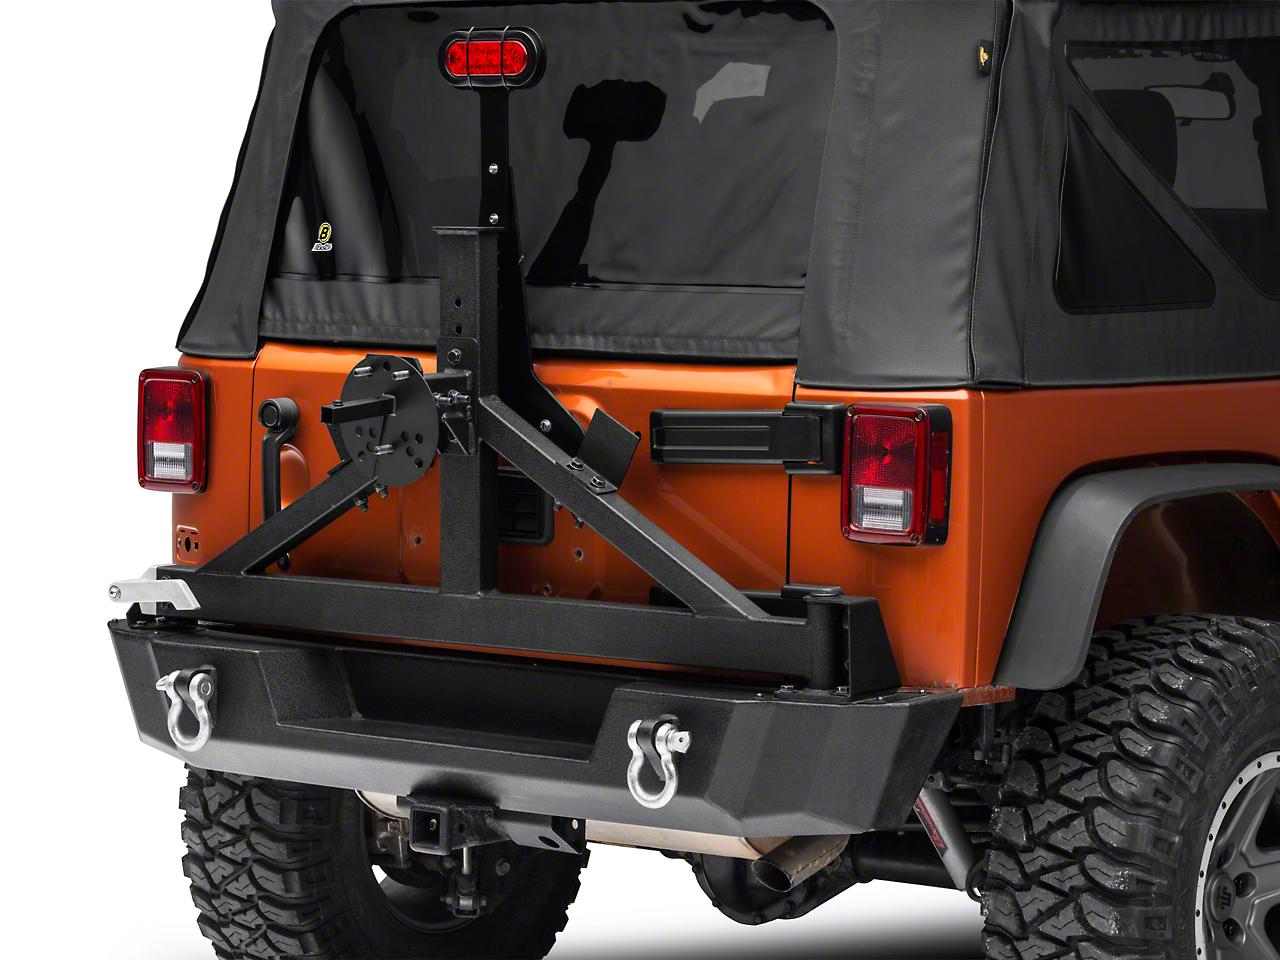 RedRock 4x4 Tire Carrier Mounted License Plate Bracket (07-18 Jeep Wrangler JK; 2018 Jeep Wrangler JL)